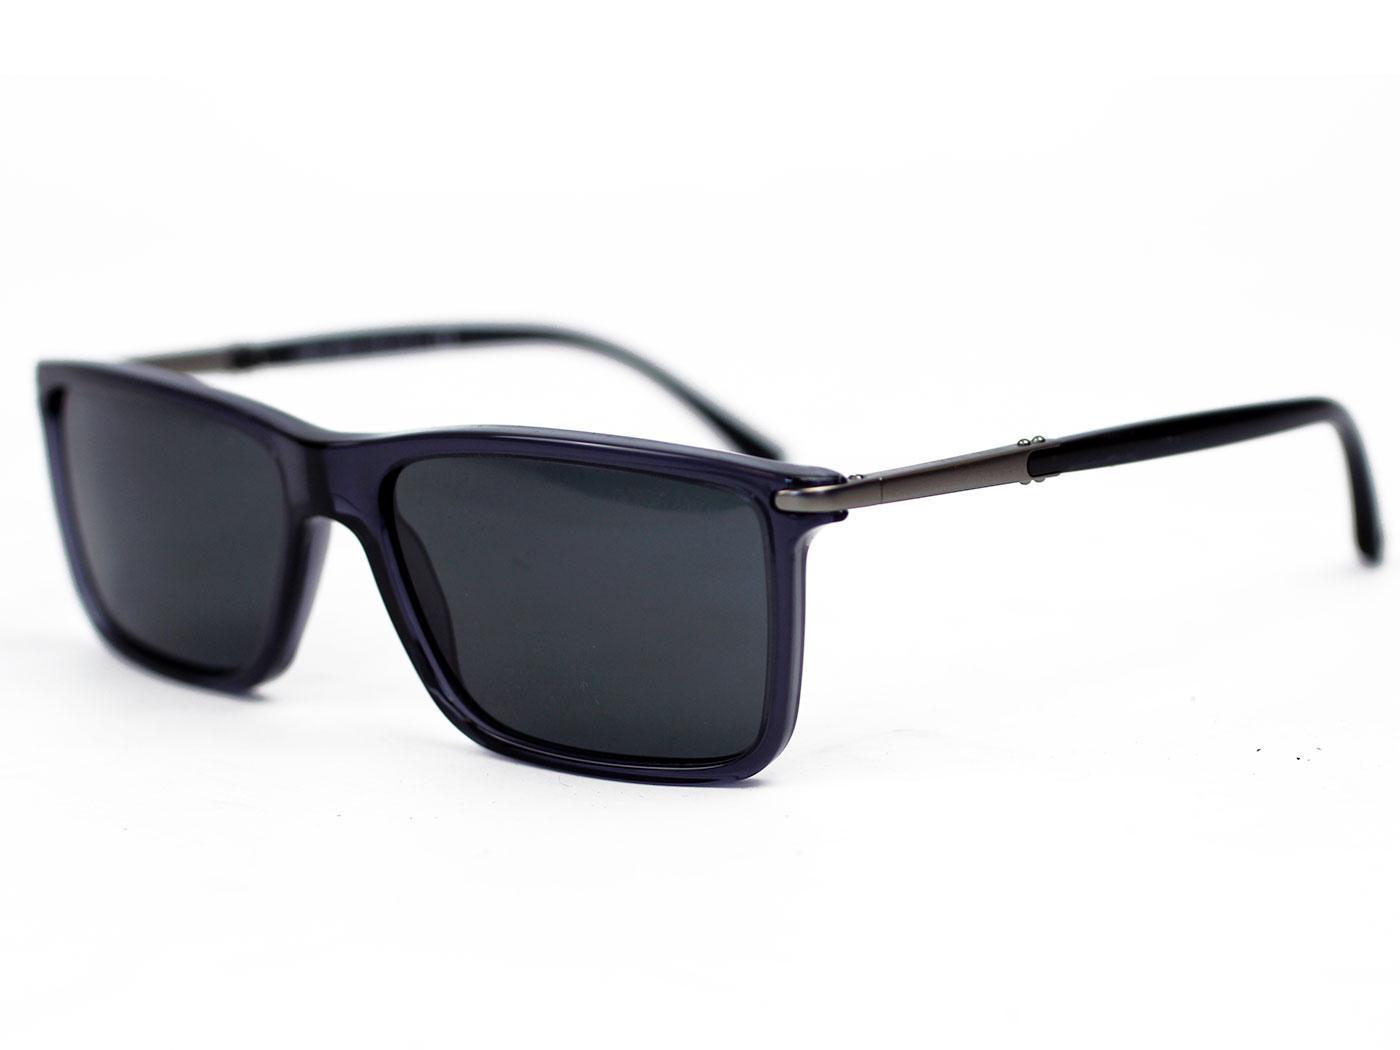 Giorgio Armani Retro Mod Wayfarer Sunglasses in Dark Grey 0AR8010